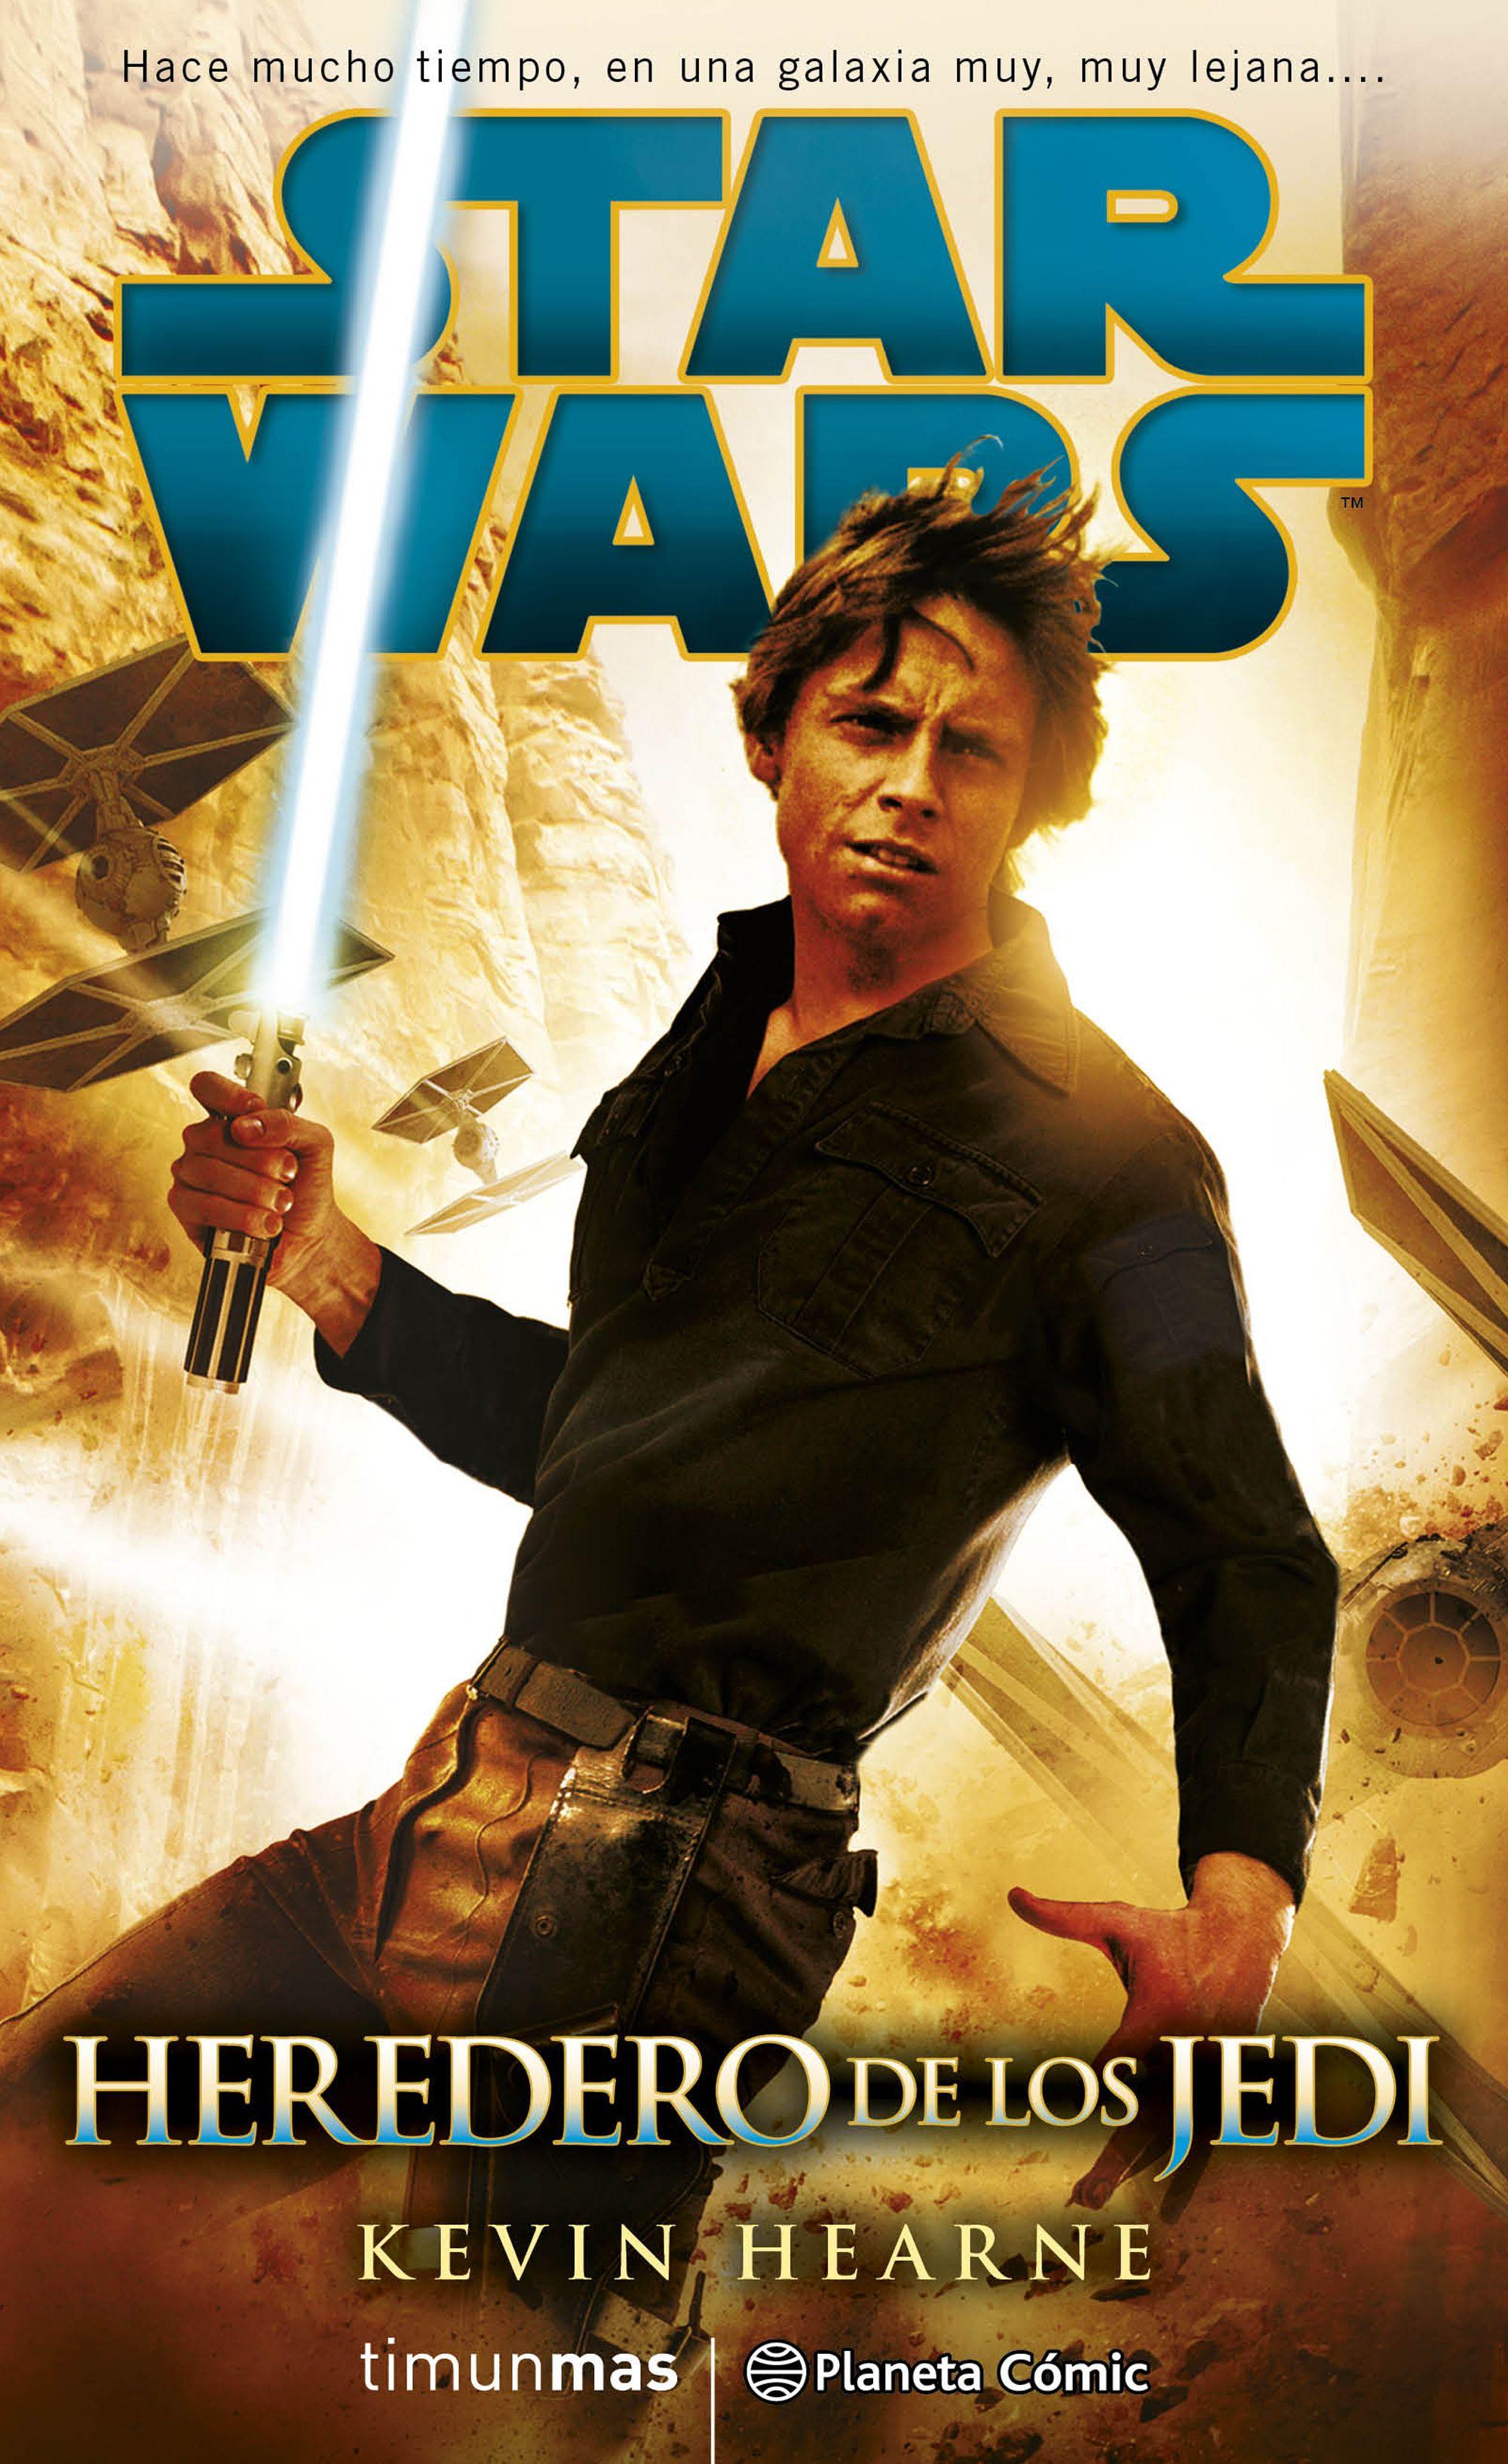 Herdero de los Jedi